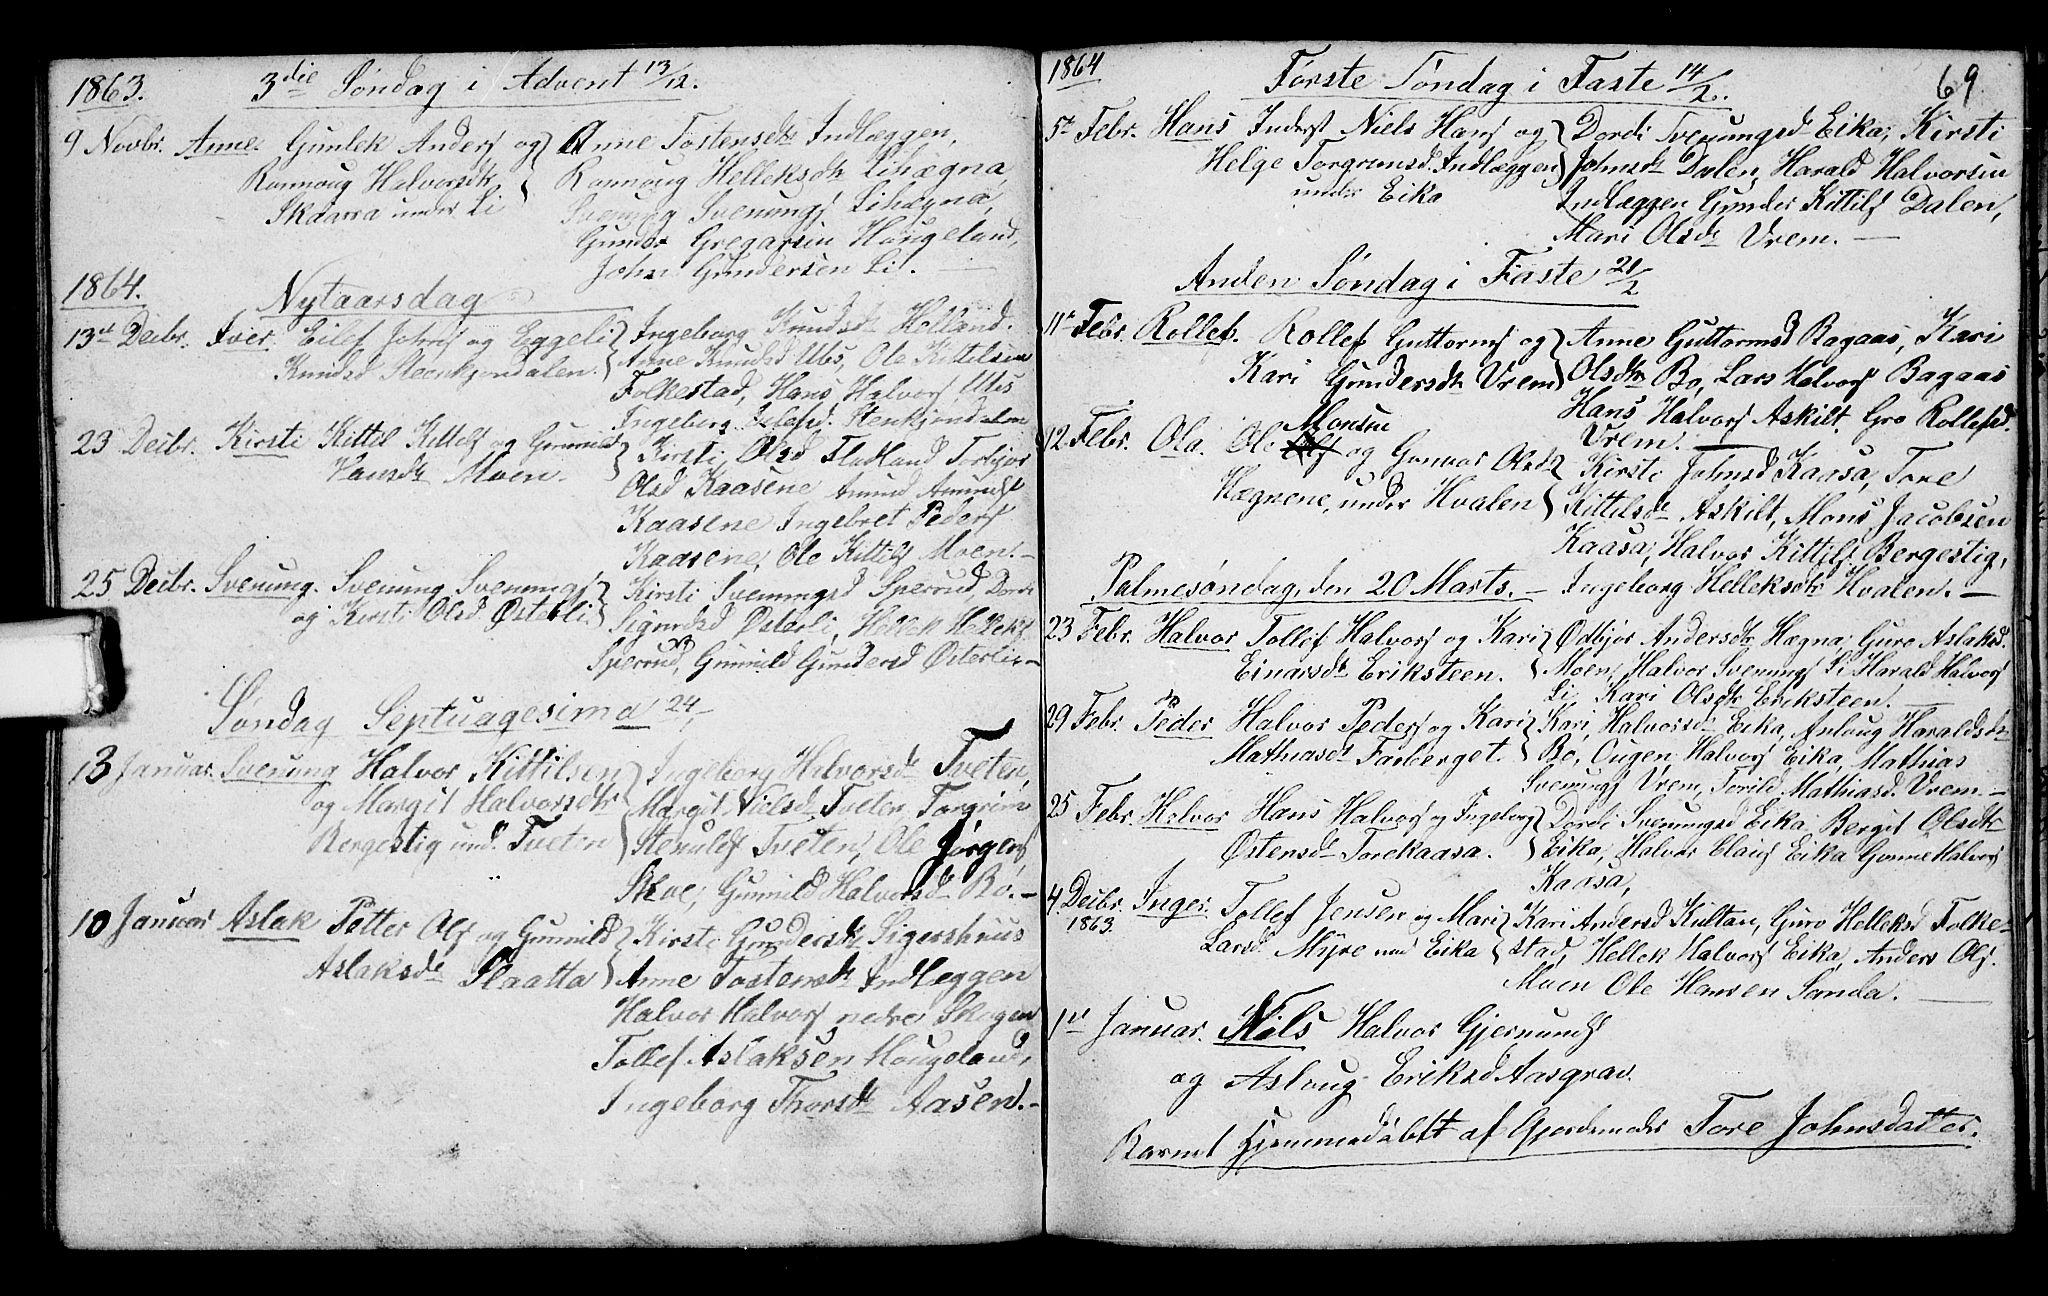 SAKO, Bø kirkebøker, G/Ga/L0002: Klokkerbok nr. 2, 1853-1866, s. 69